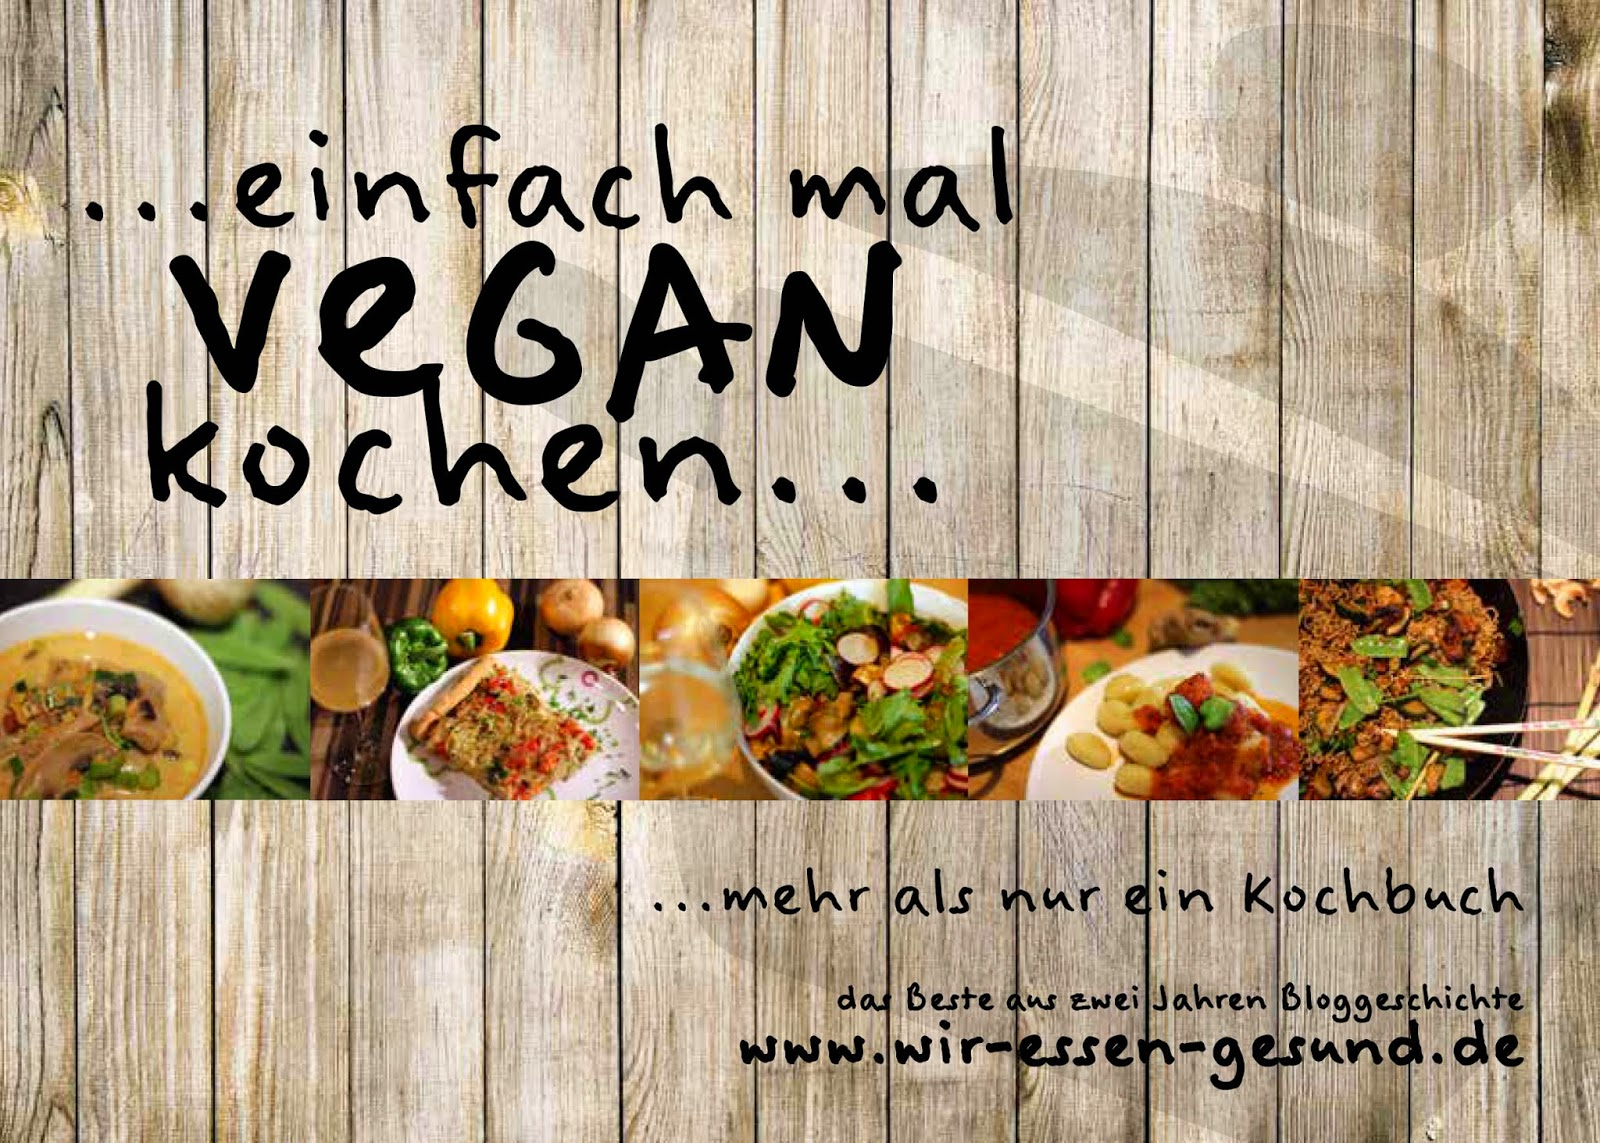 http://www.wir-essen-gesund.de/?pa=30